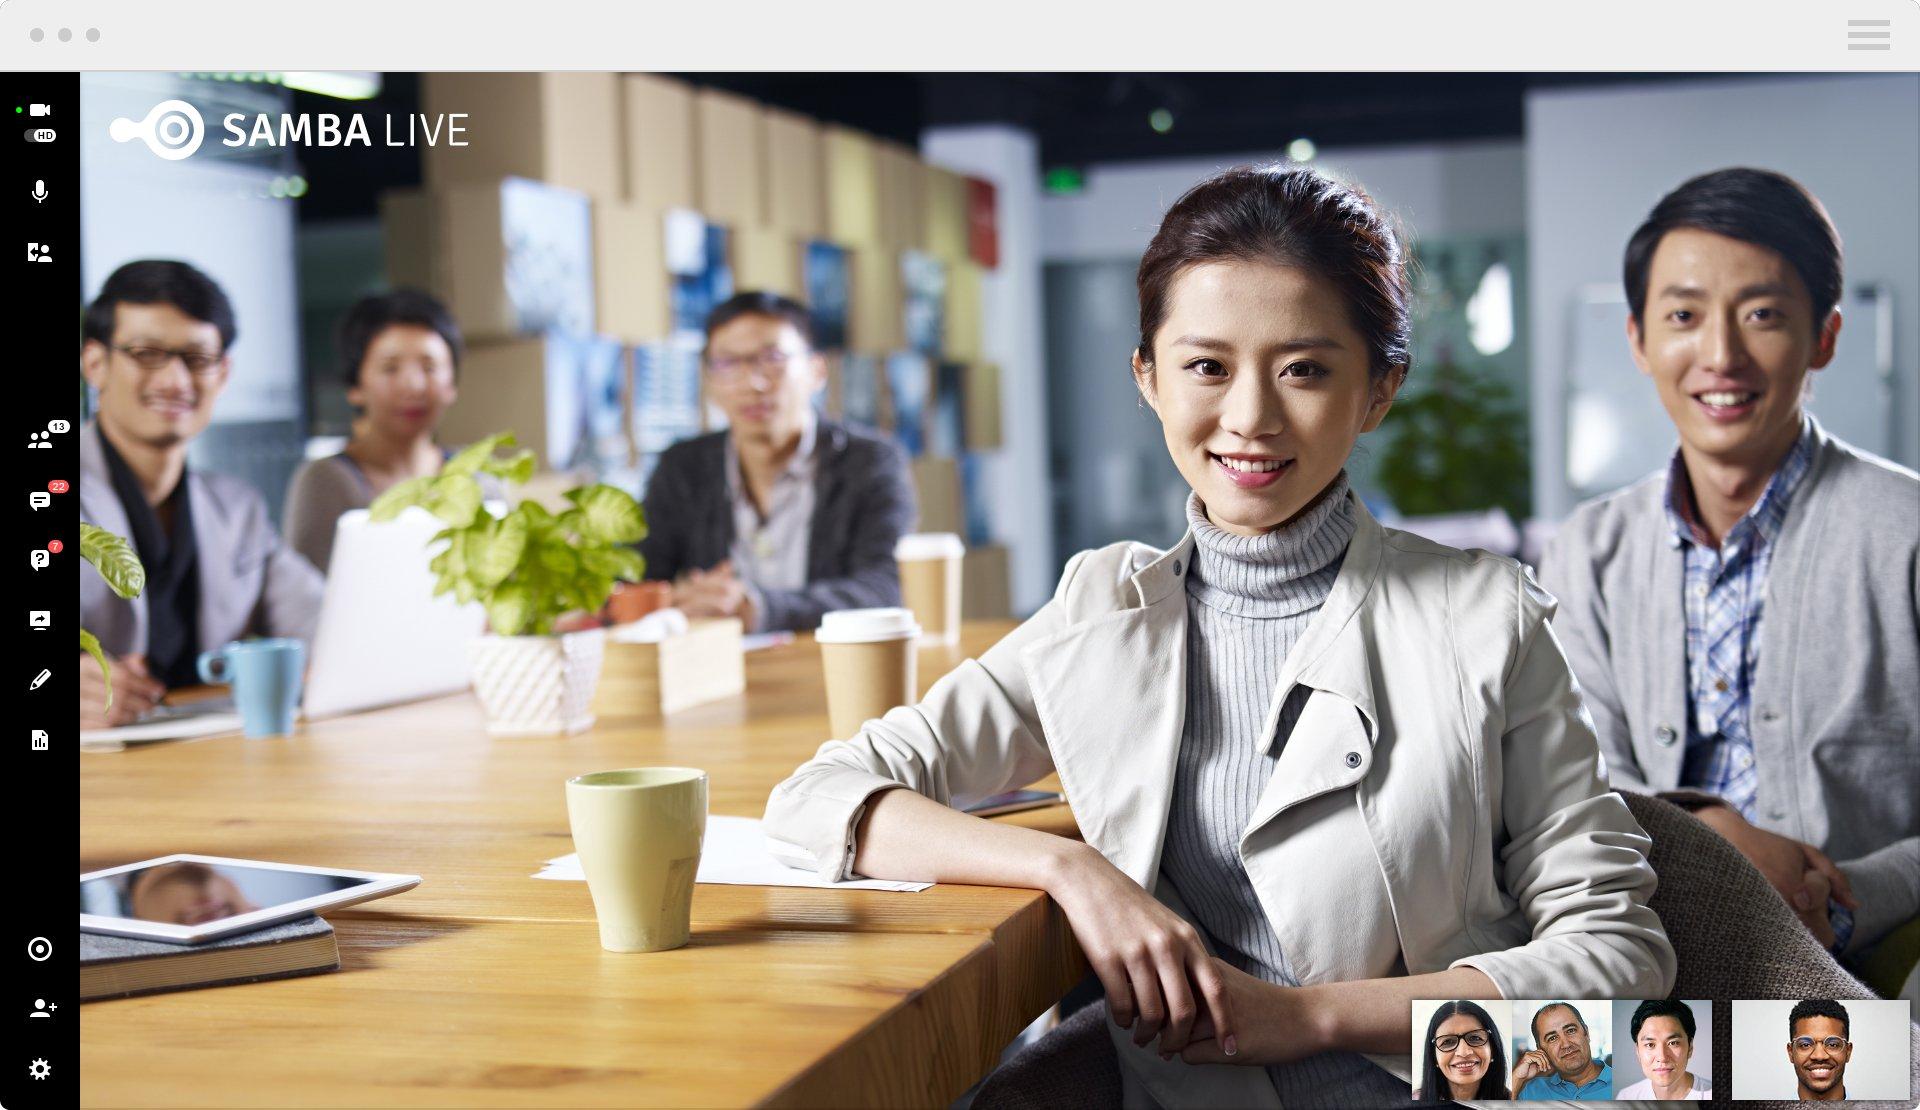 HD videoconferencing